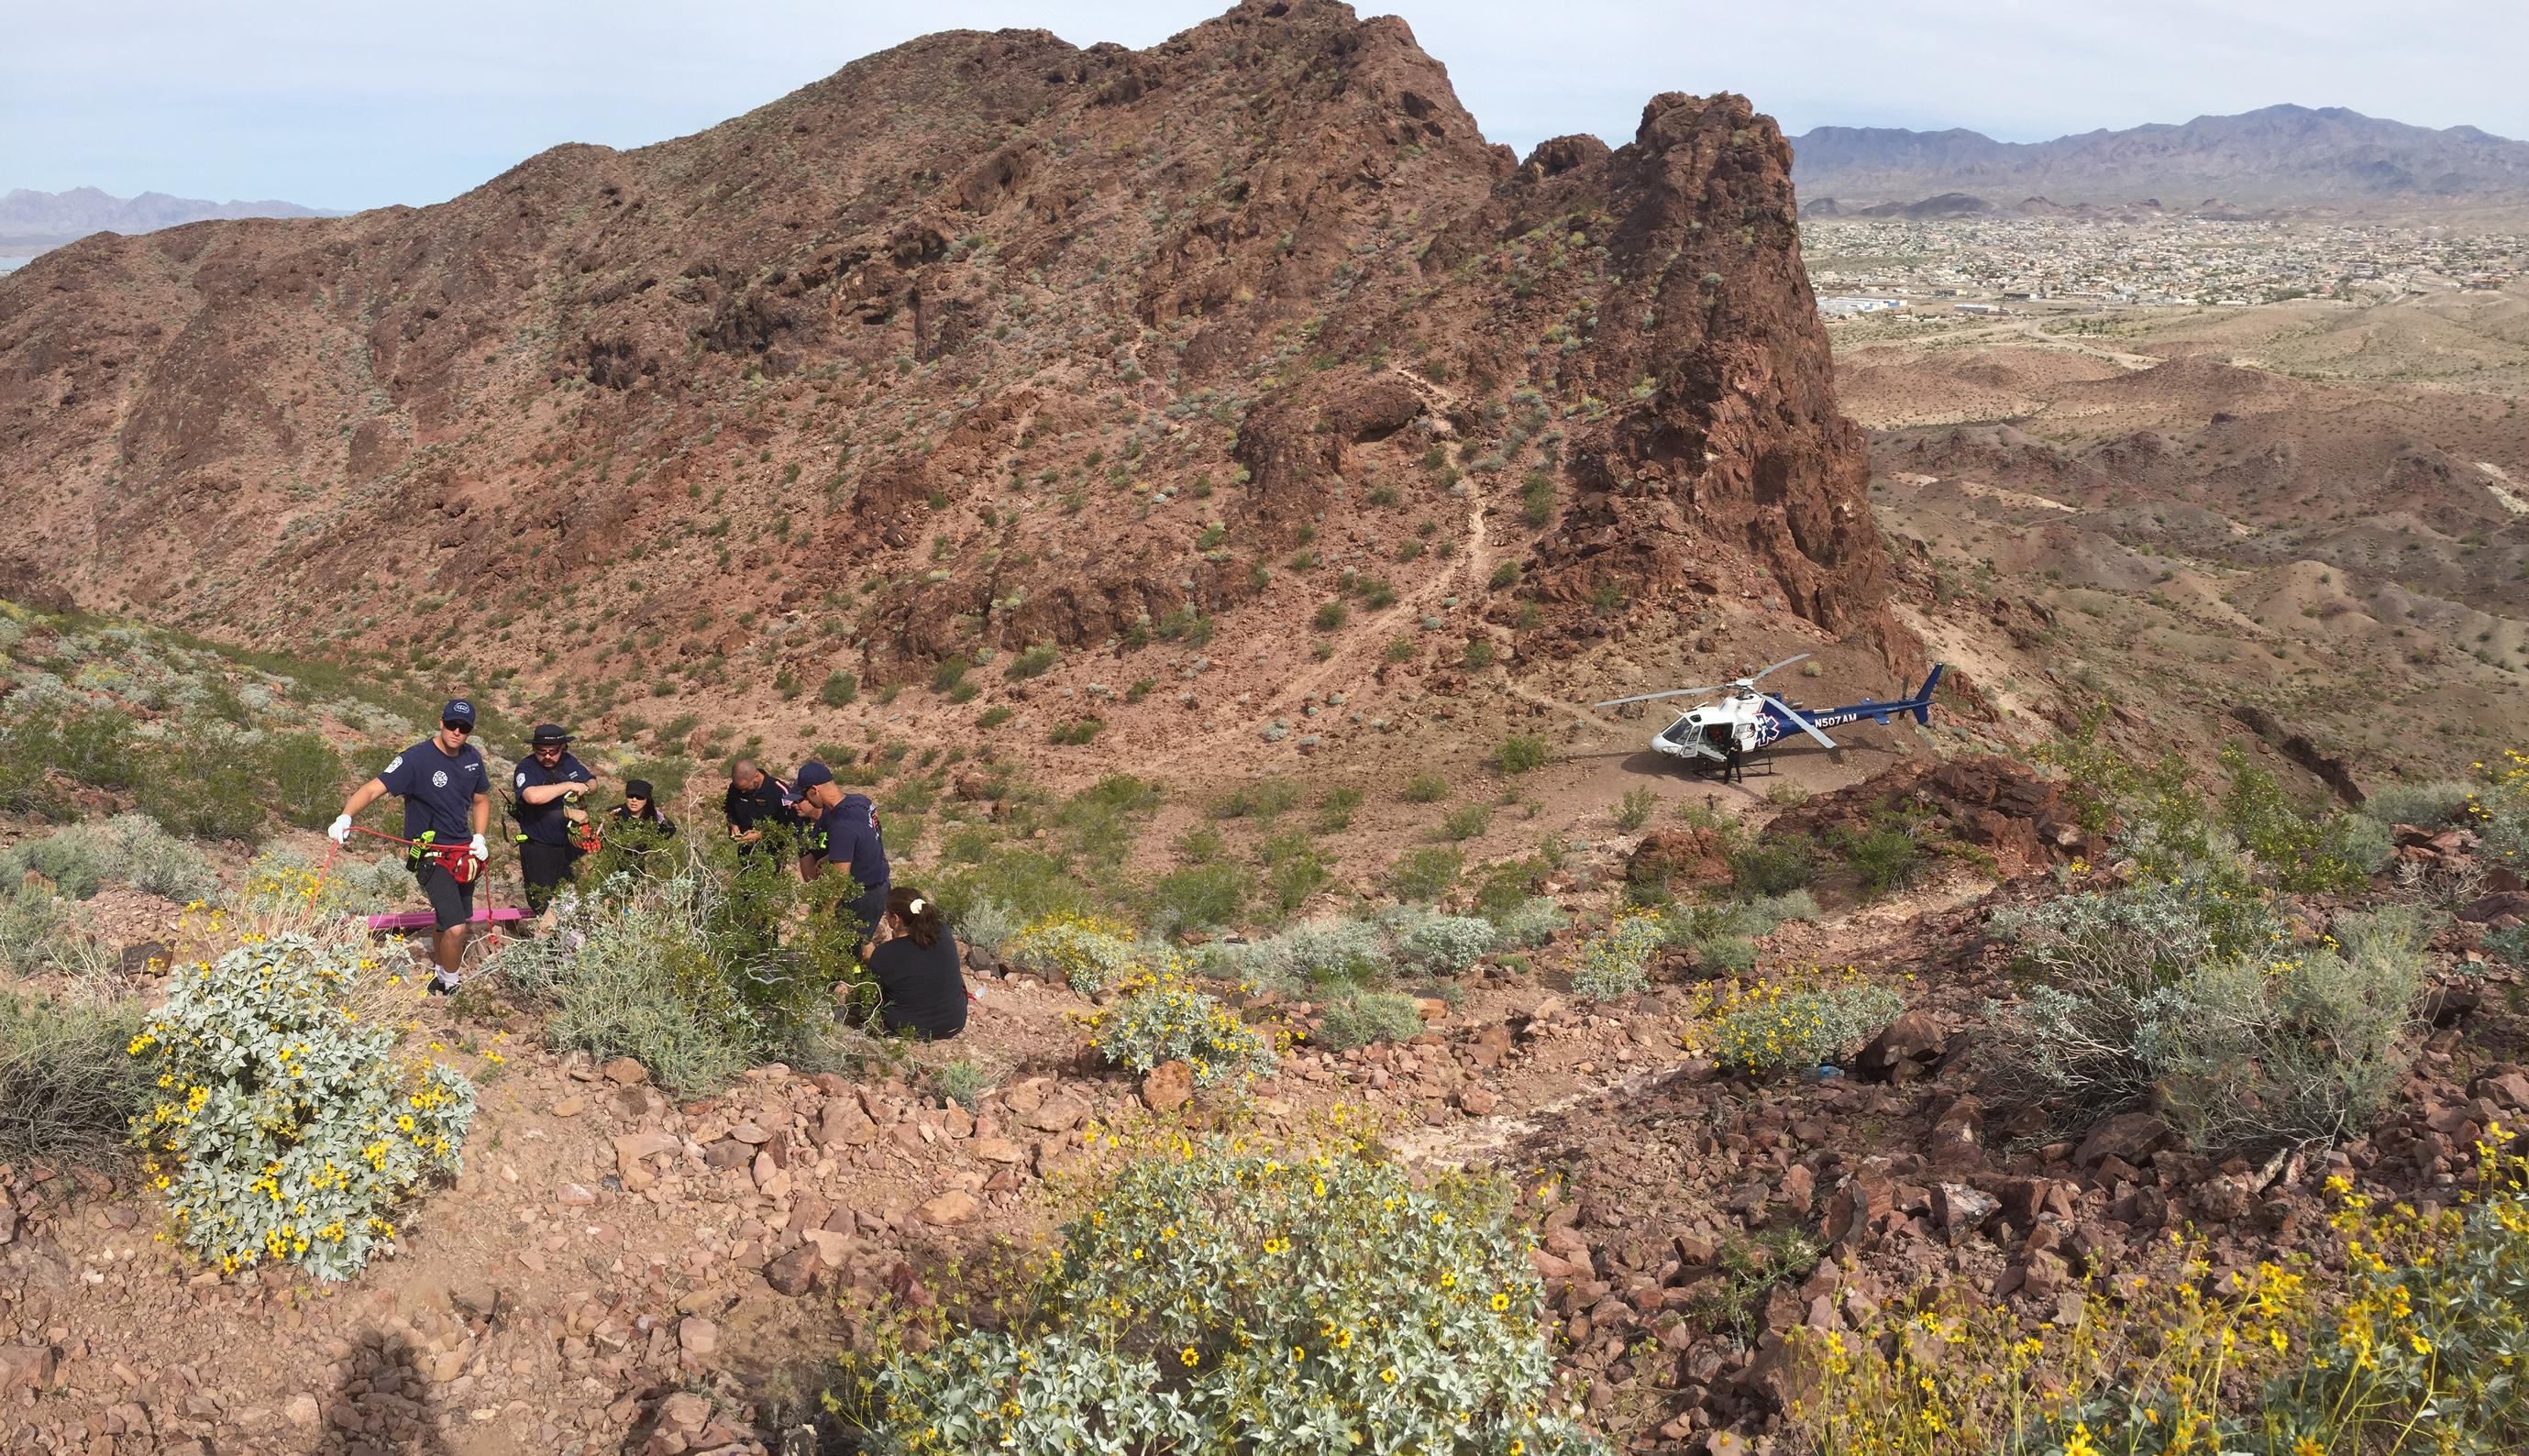 Table Top Mountain Rescue